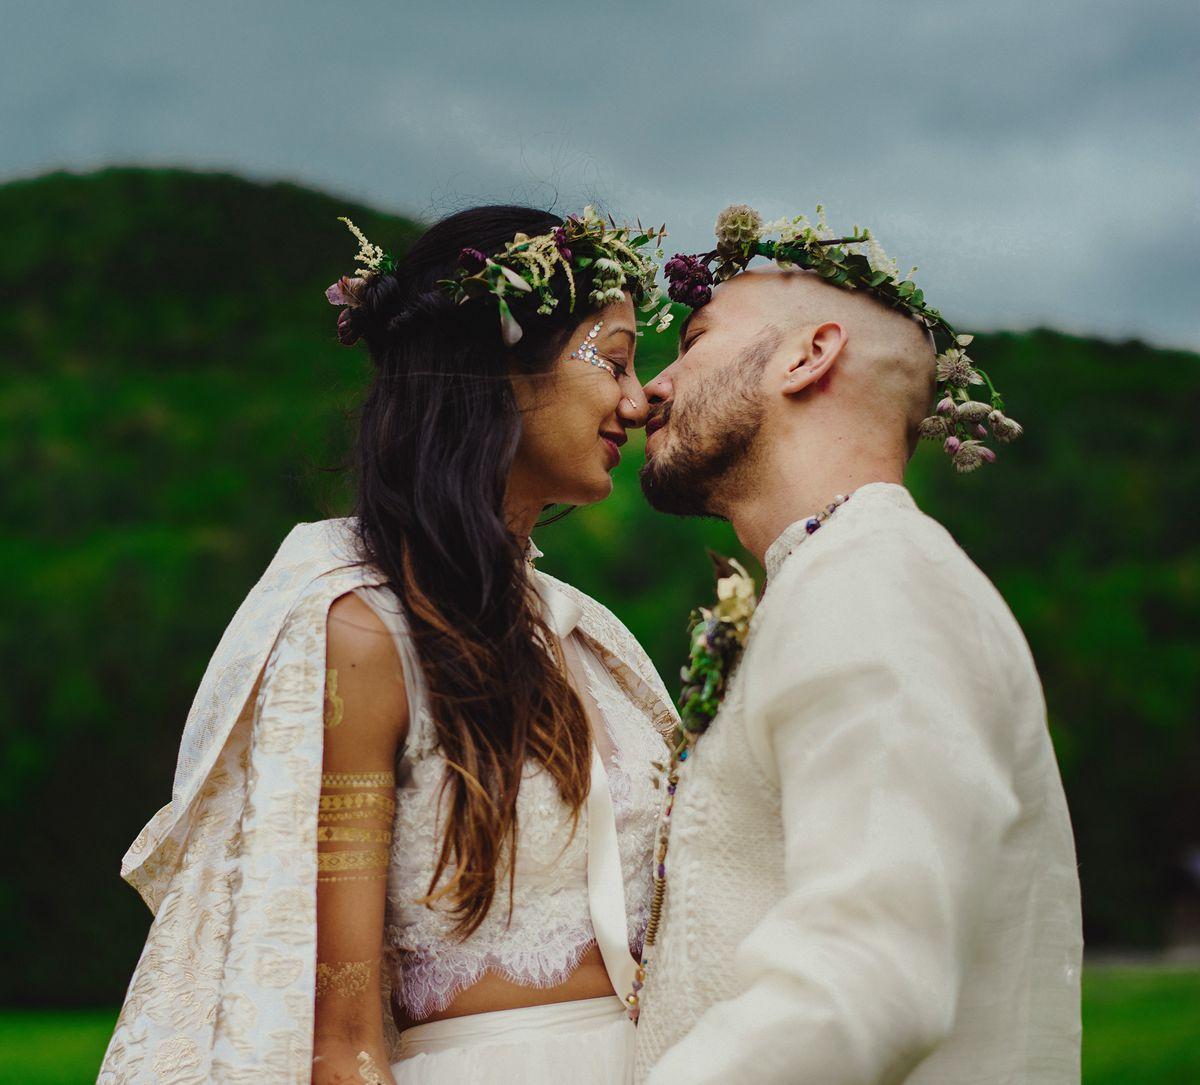 Saleena and Lawrence, founders of BKE Kombucha, on their wedding day